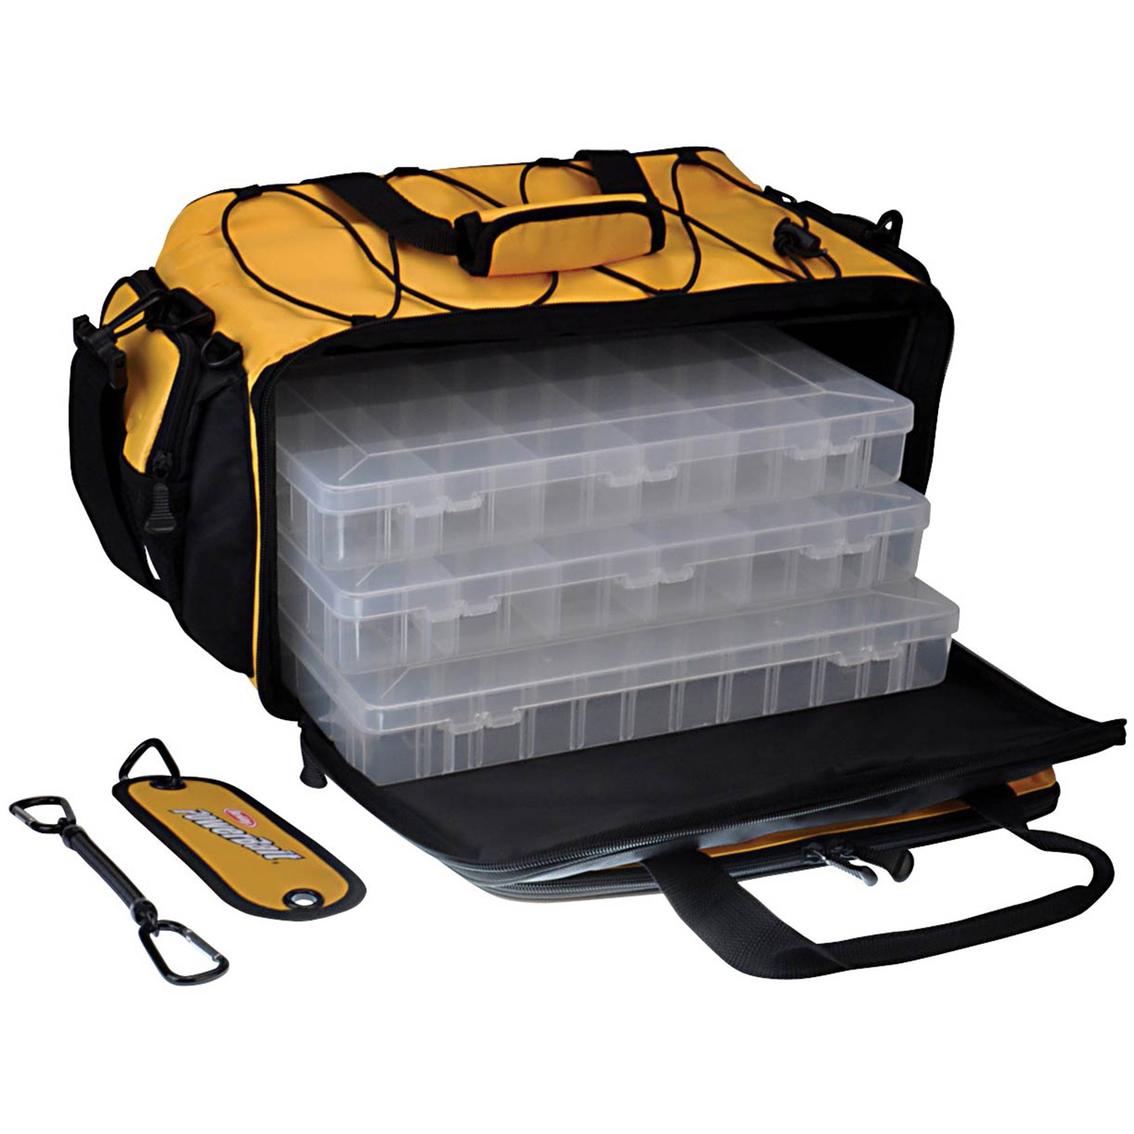 Berkley powerbait medium tackle bag fishing accessories for Berkley fishing apparel